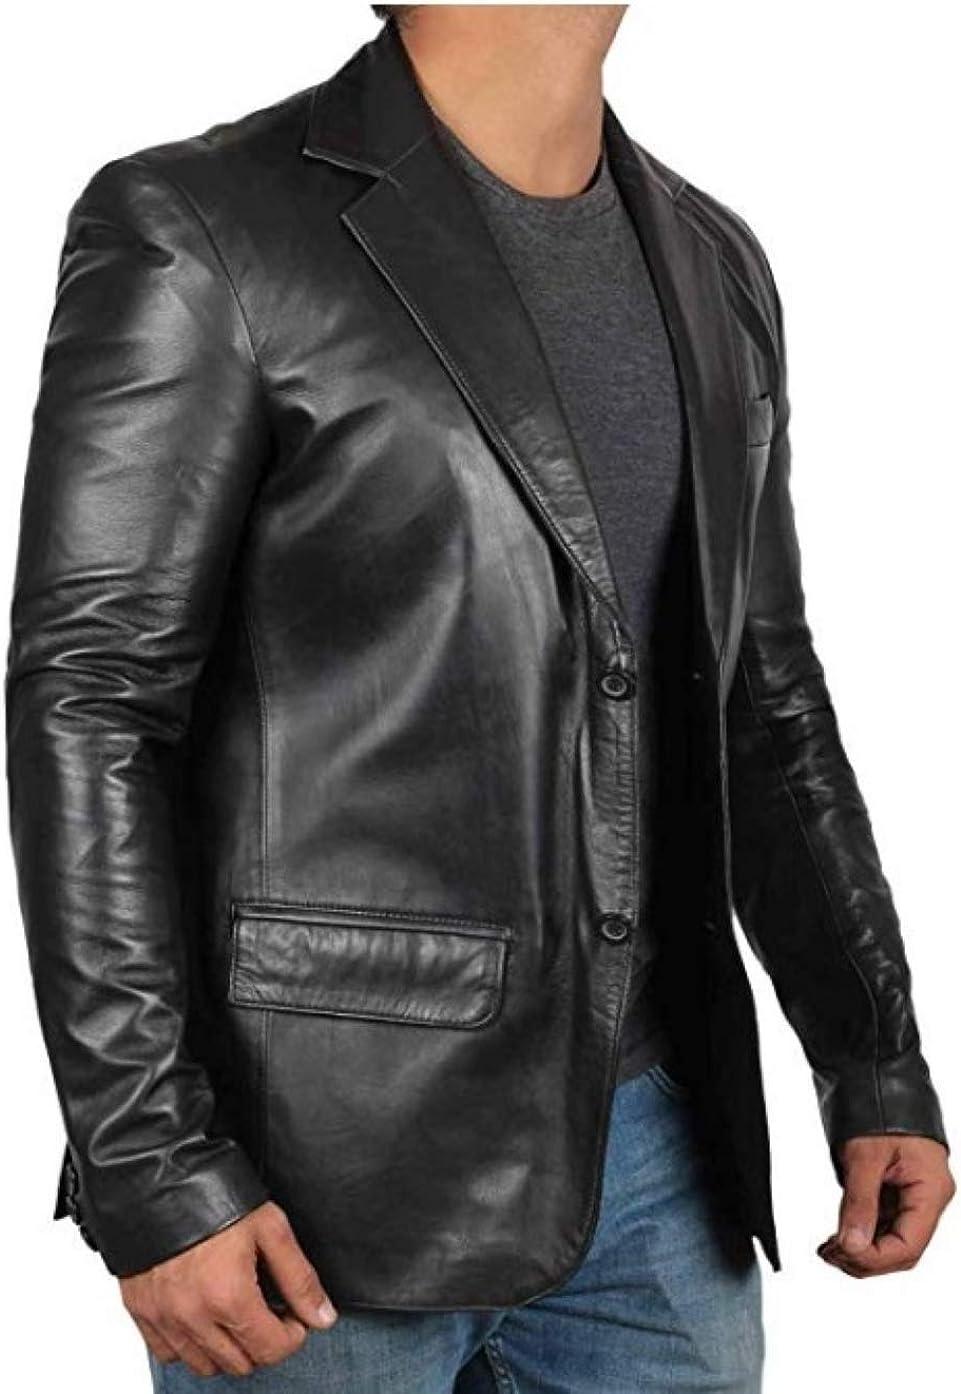 Classic Black Sheepskin Dress Coat Lambskin Leather Blazer Jacket Regular